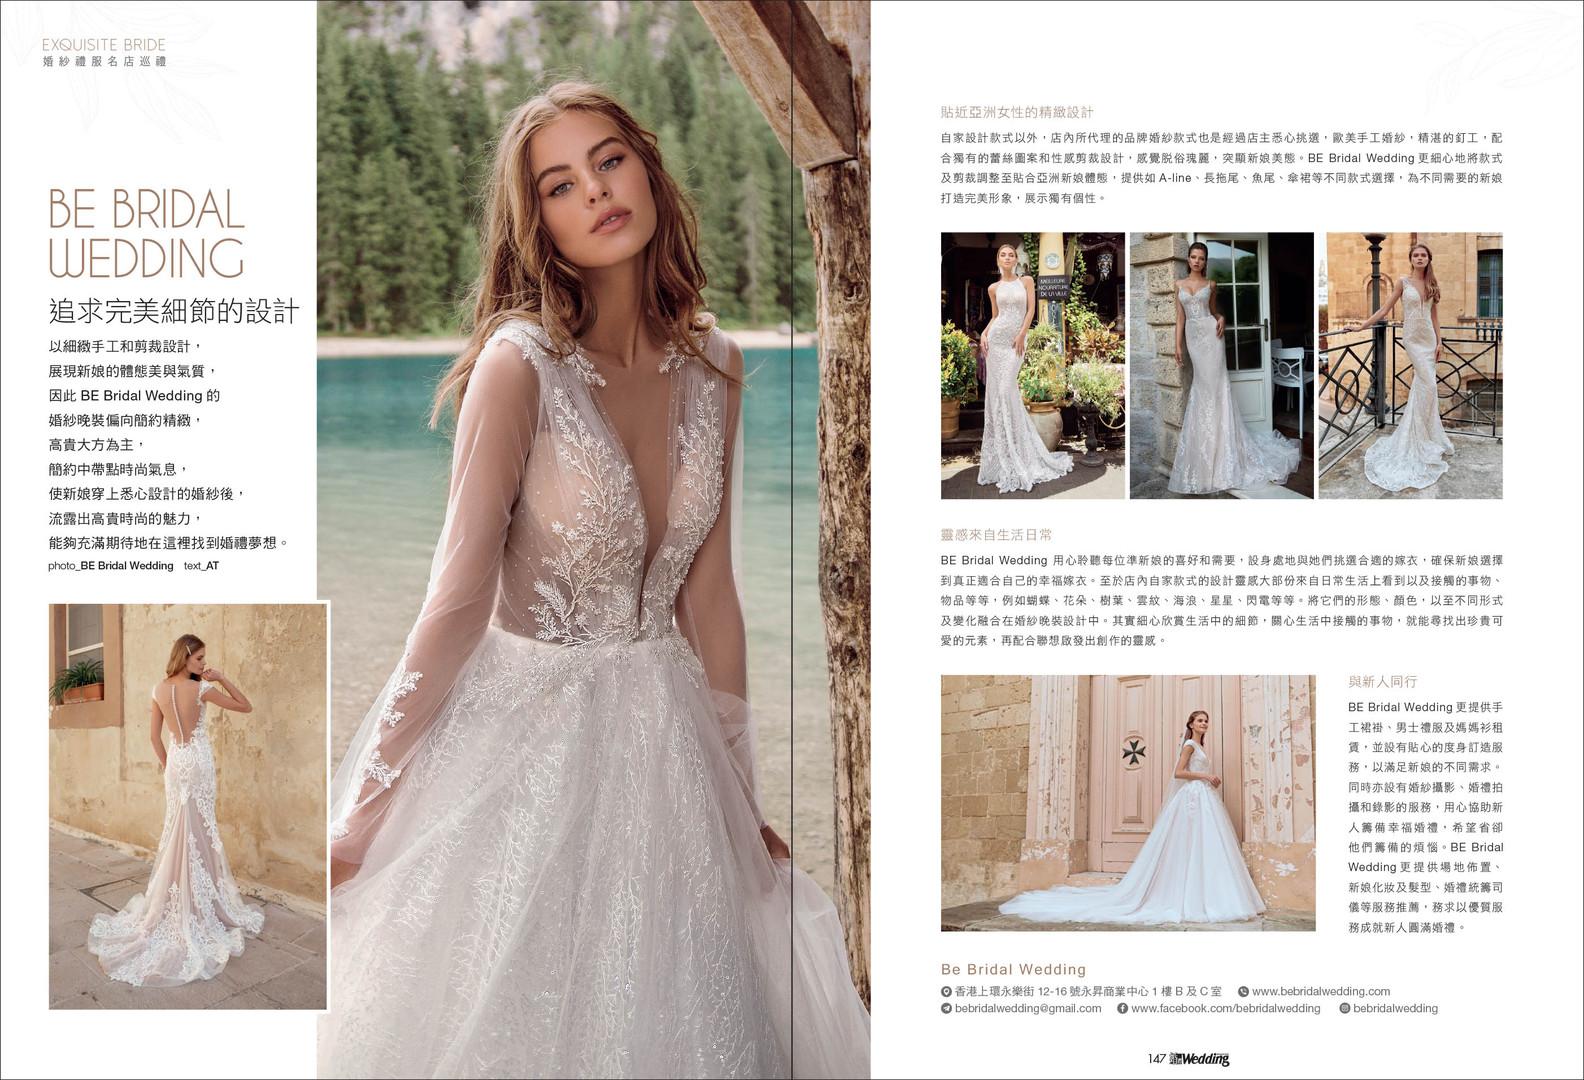 232 202003 Be Bridal Wedding.jpg